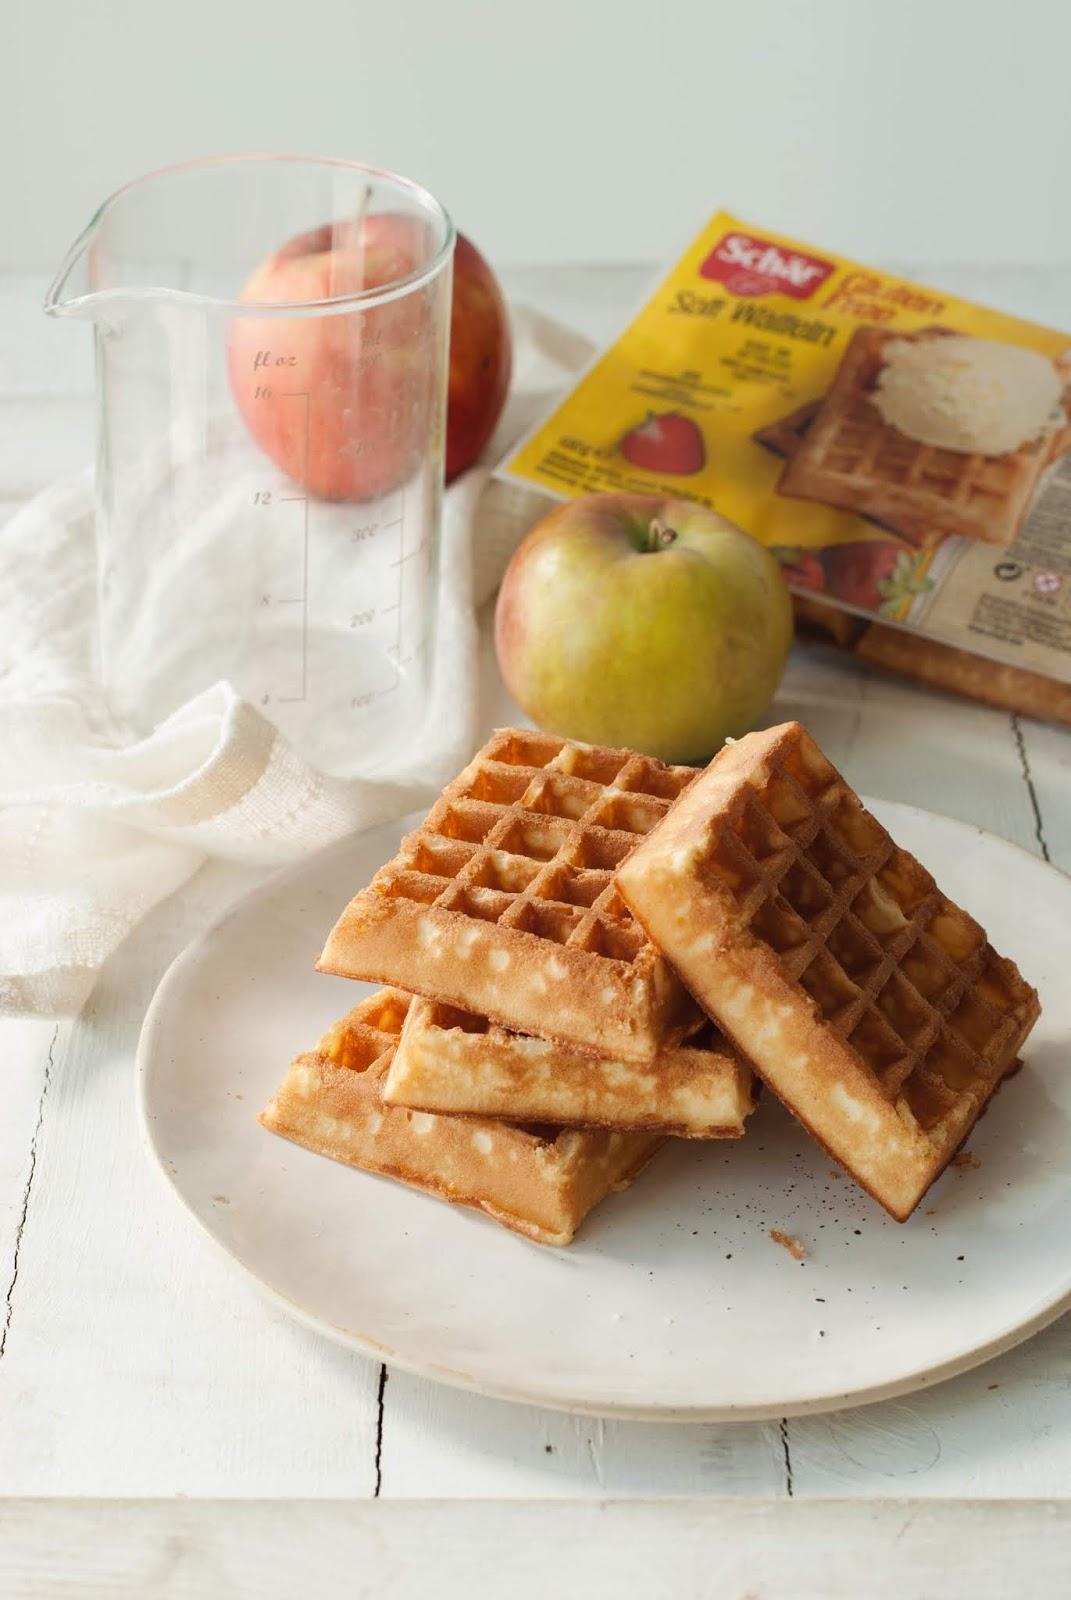 Gofry bezglutenowe Schar Soft Waffles